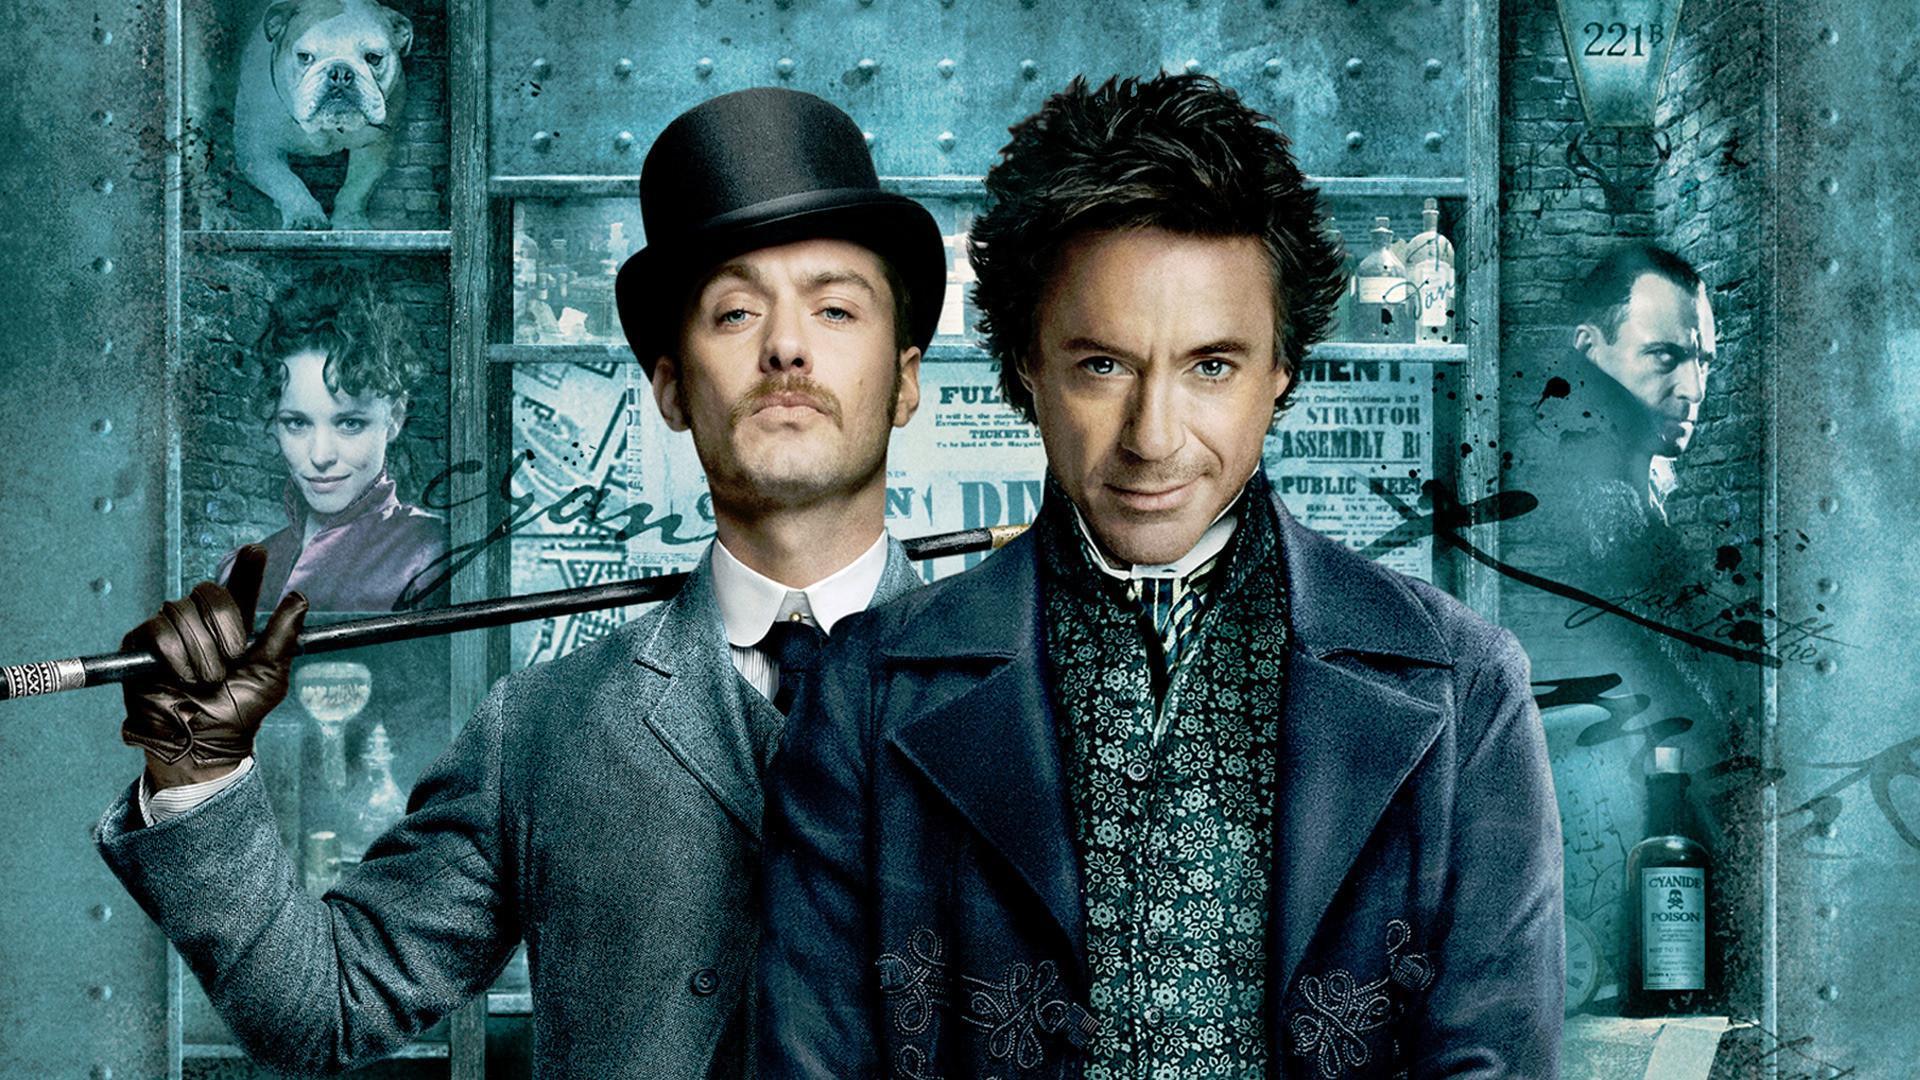 Sherlock Holmes 3, Cast and it's Release Date